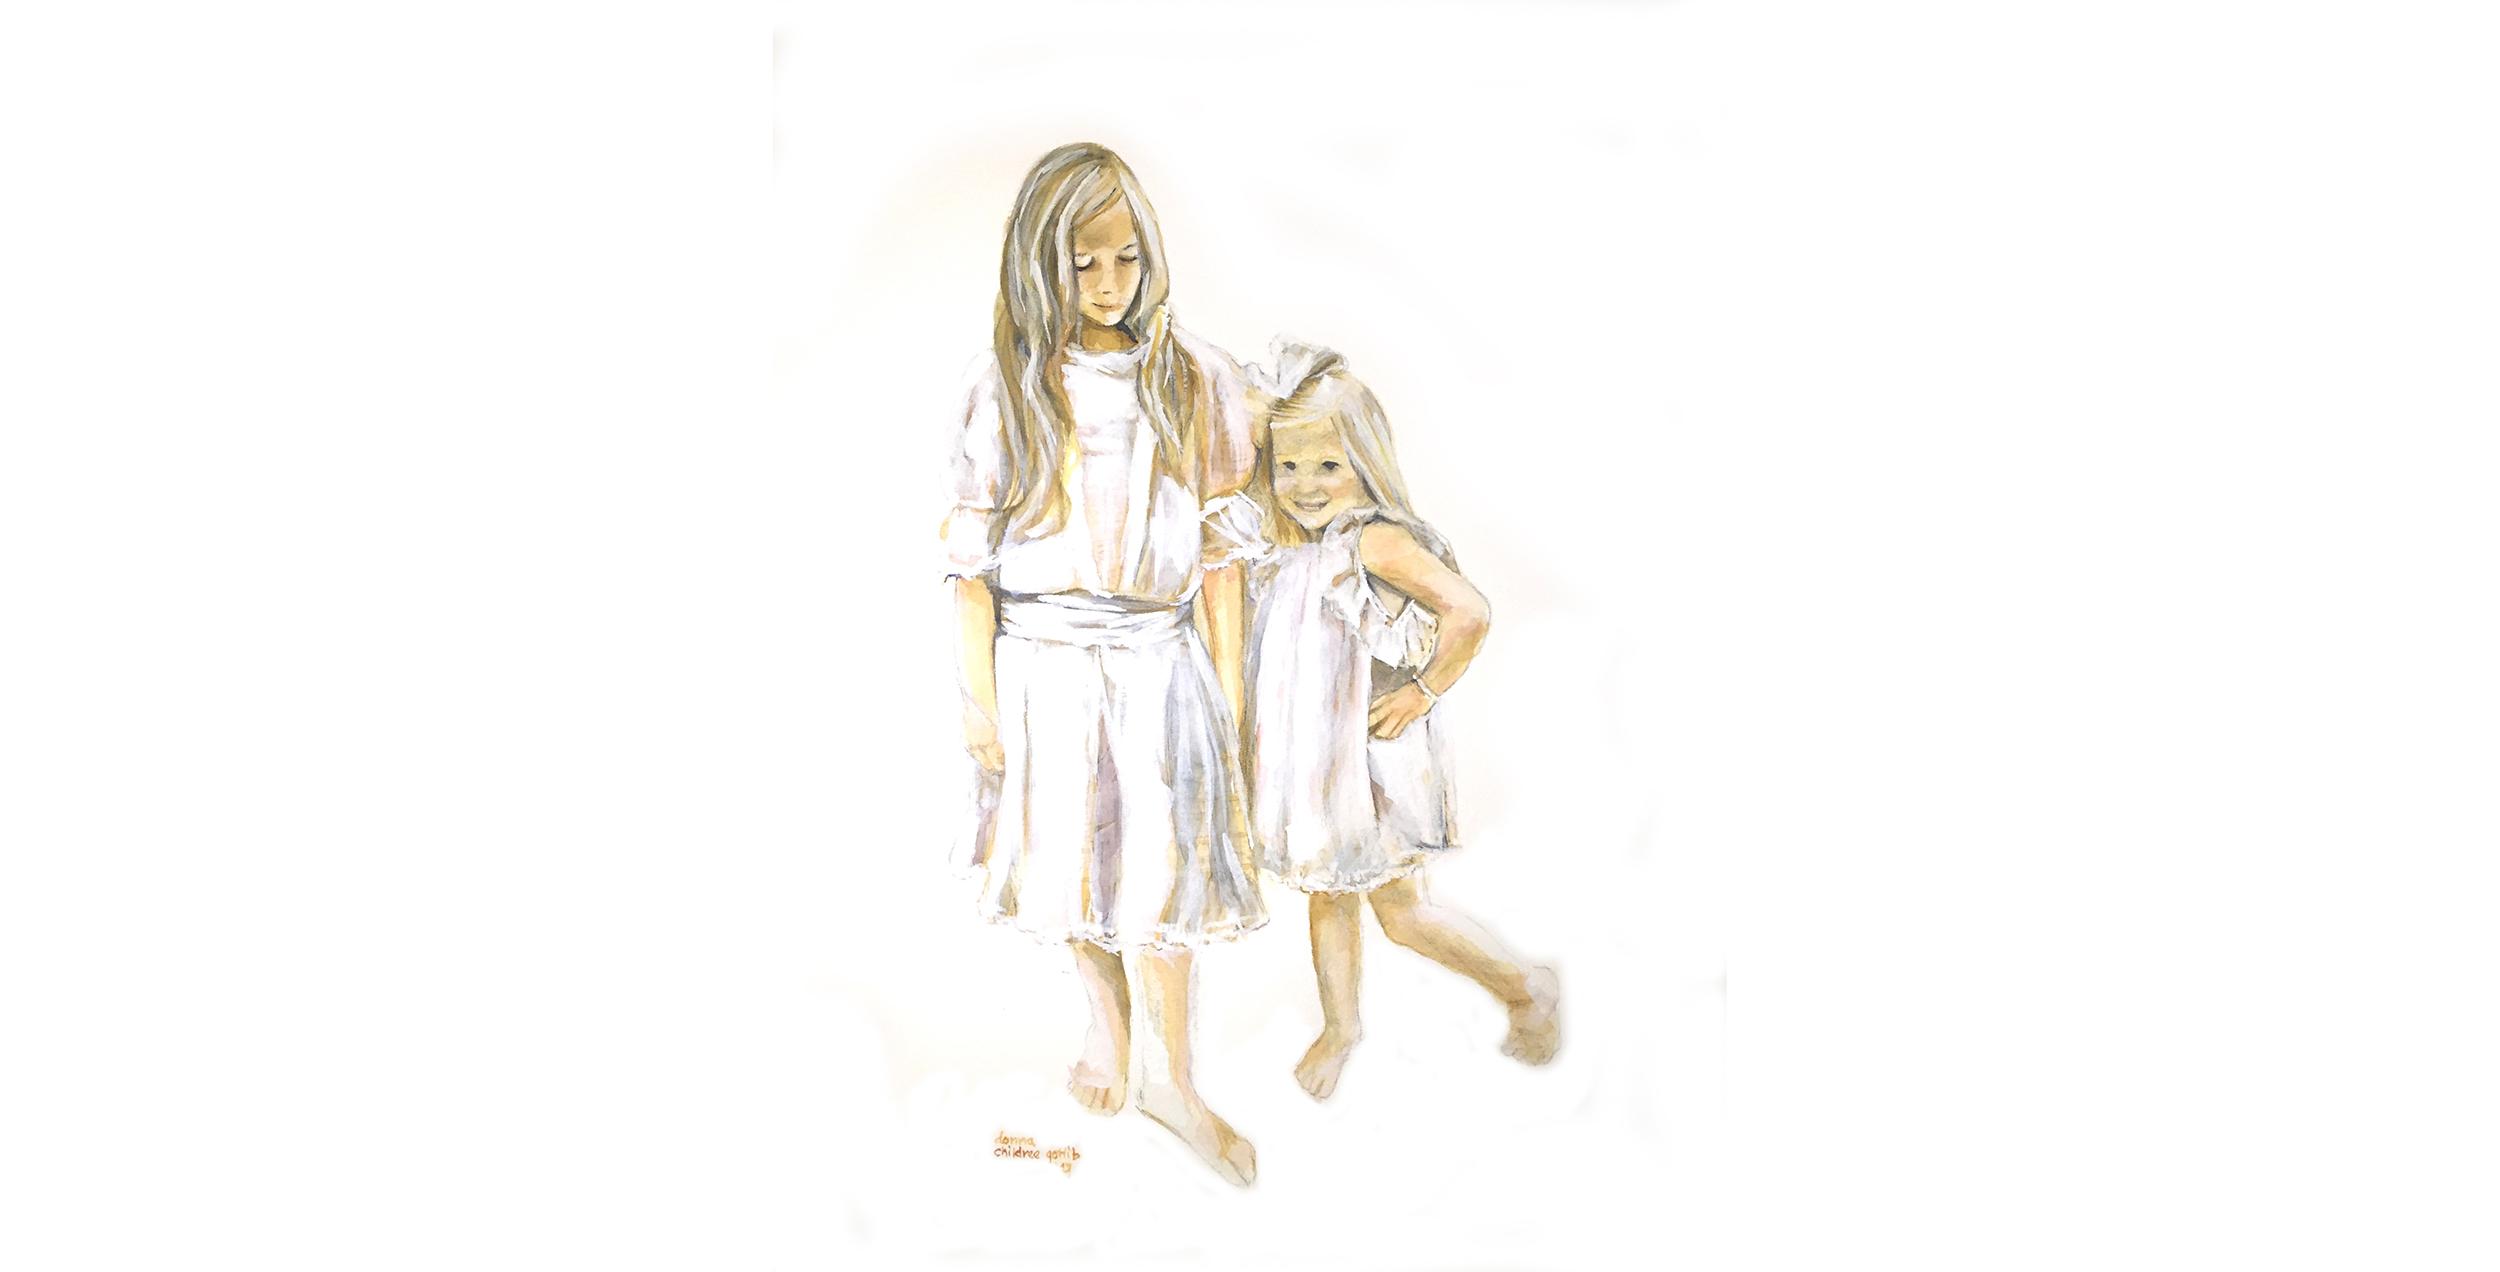 Southern-Sisters-Portrait-2649h-c.jpg